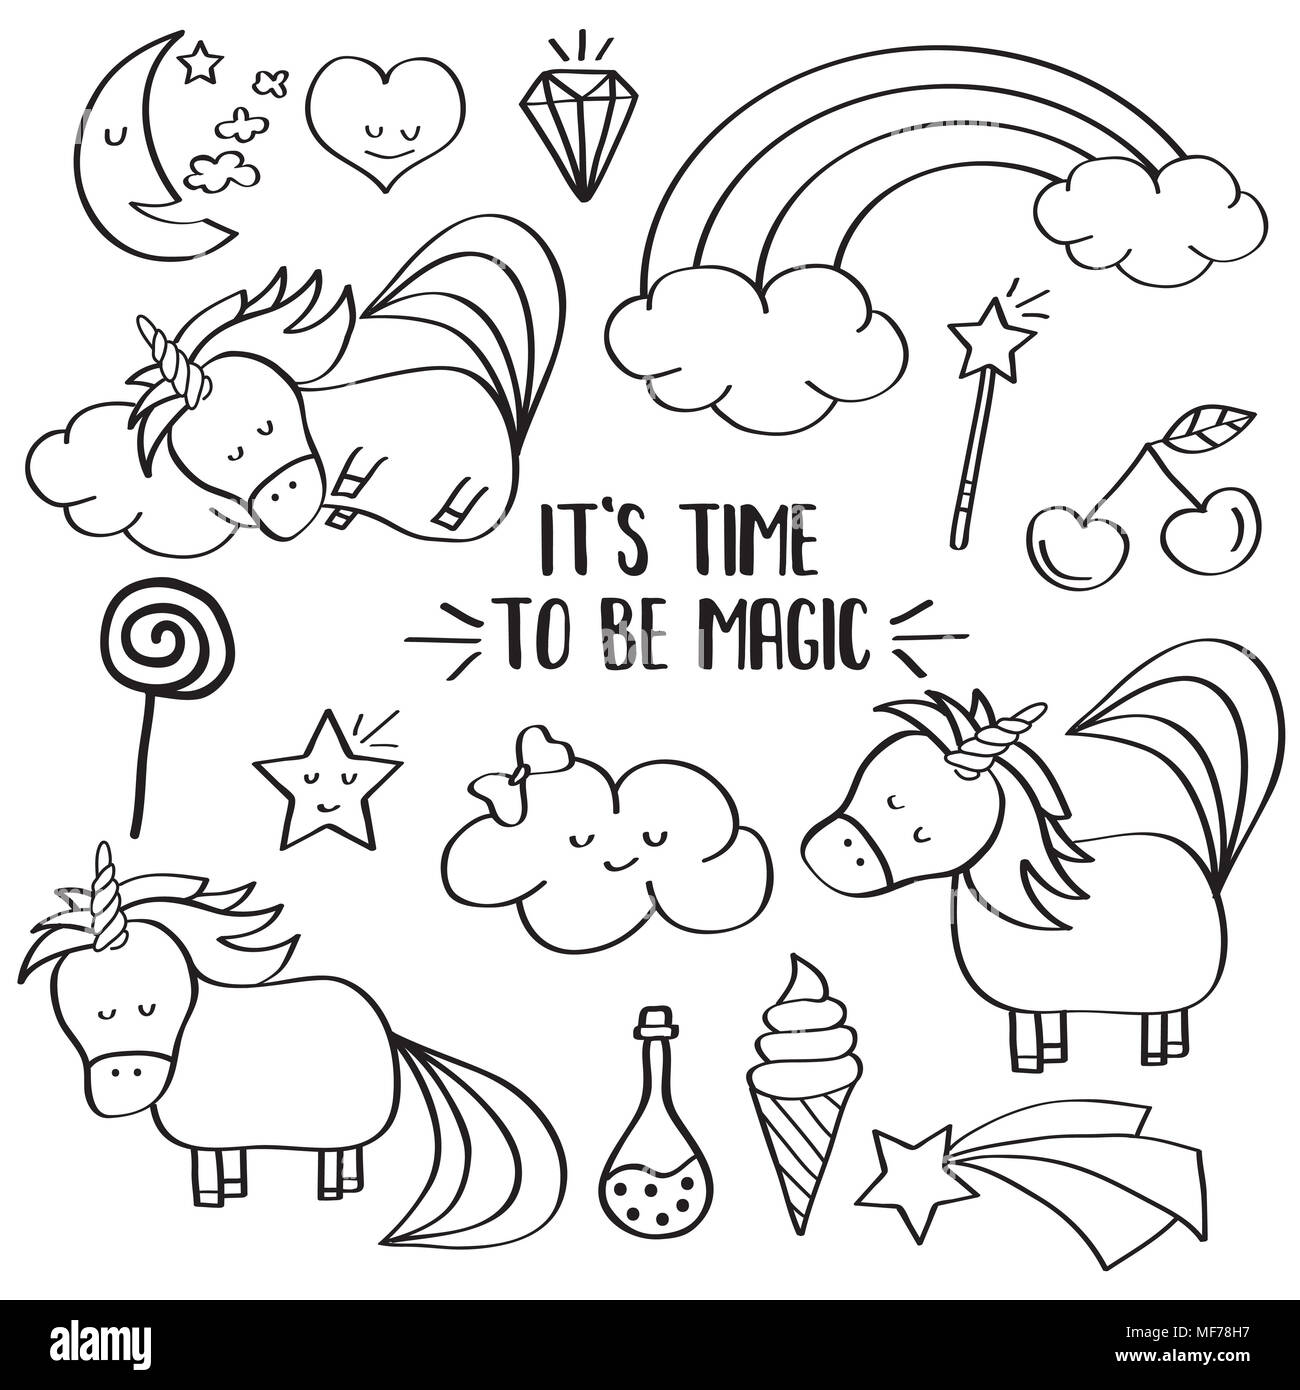 Dibujos De Unicornio Kawaii Para Colorear E Imprimir